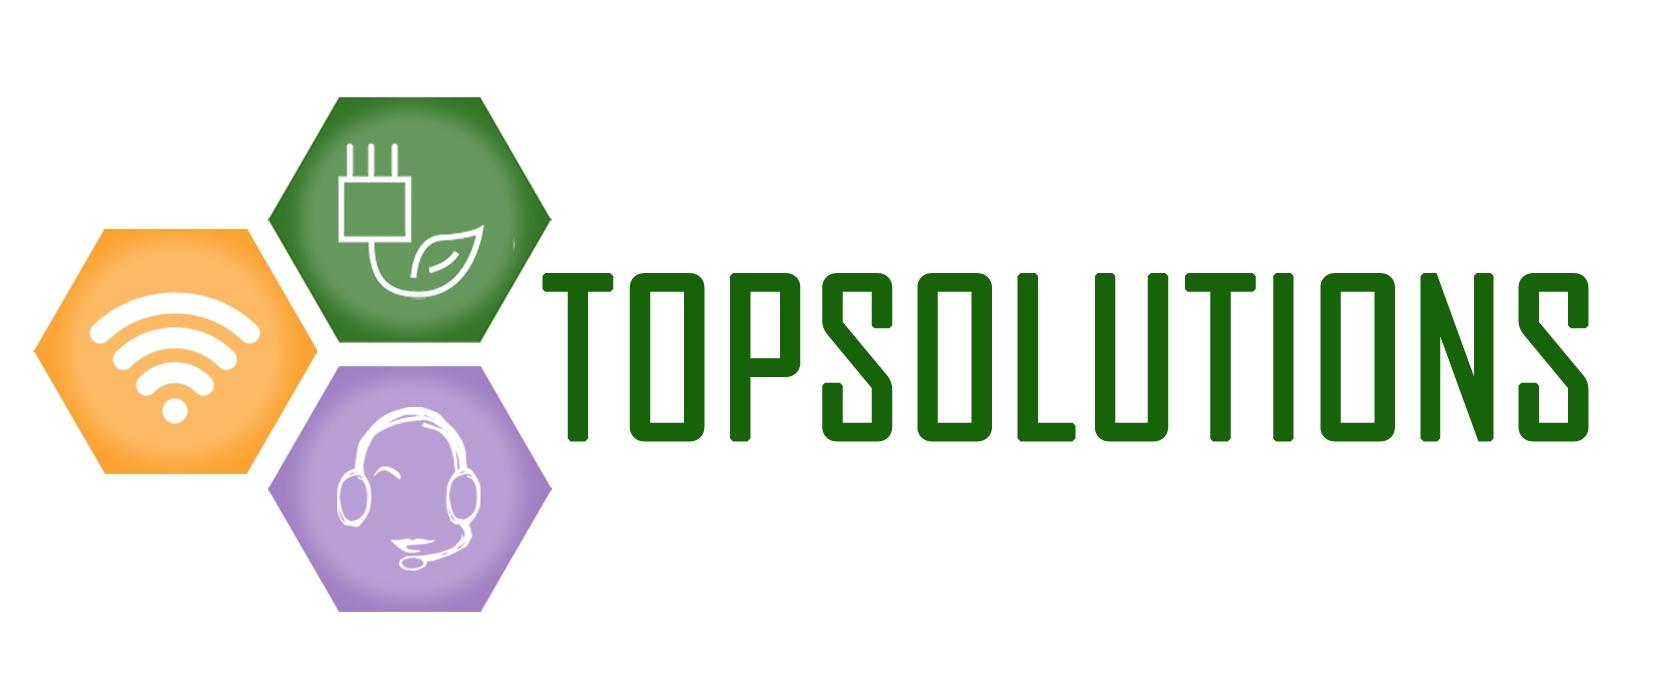 LOGO TopSolutions torino 2020